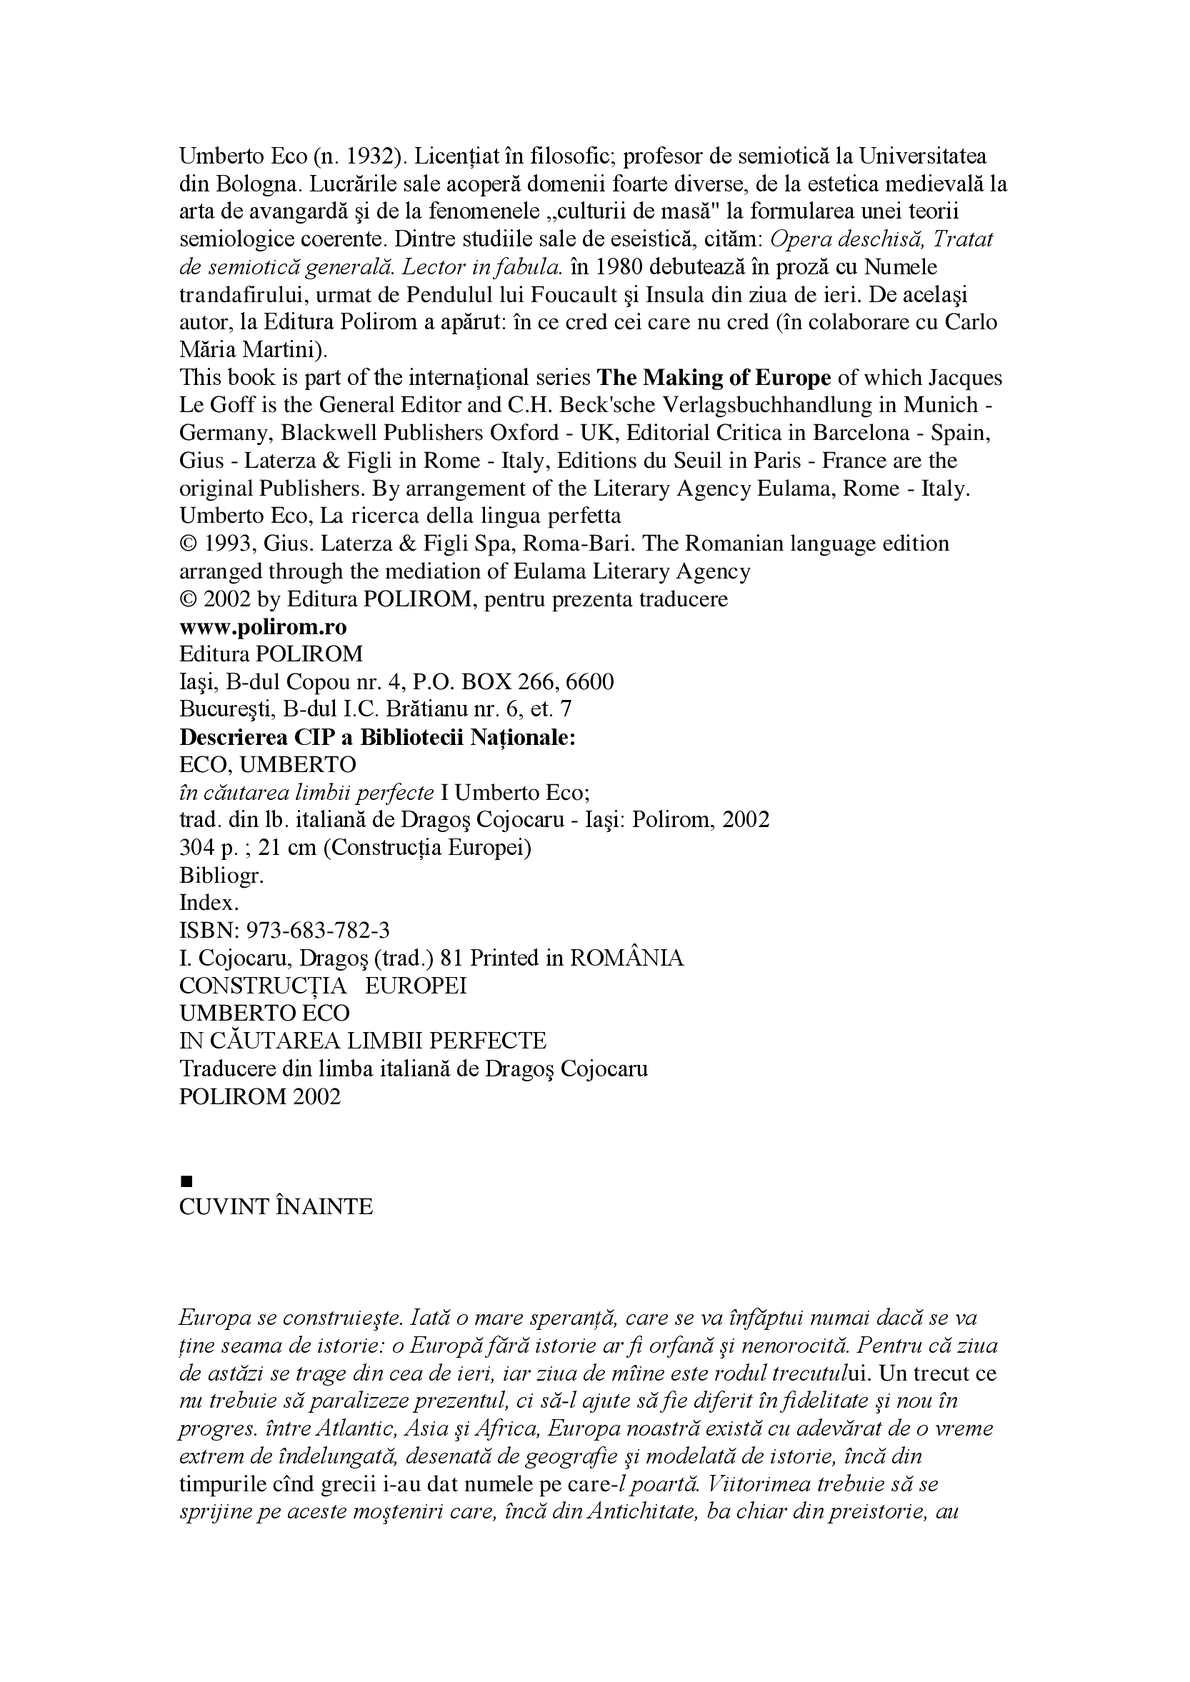 Grünberg Ludwig Optiuni Filozofice contemporane by adina - Issuu